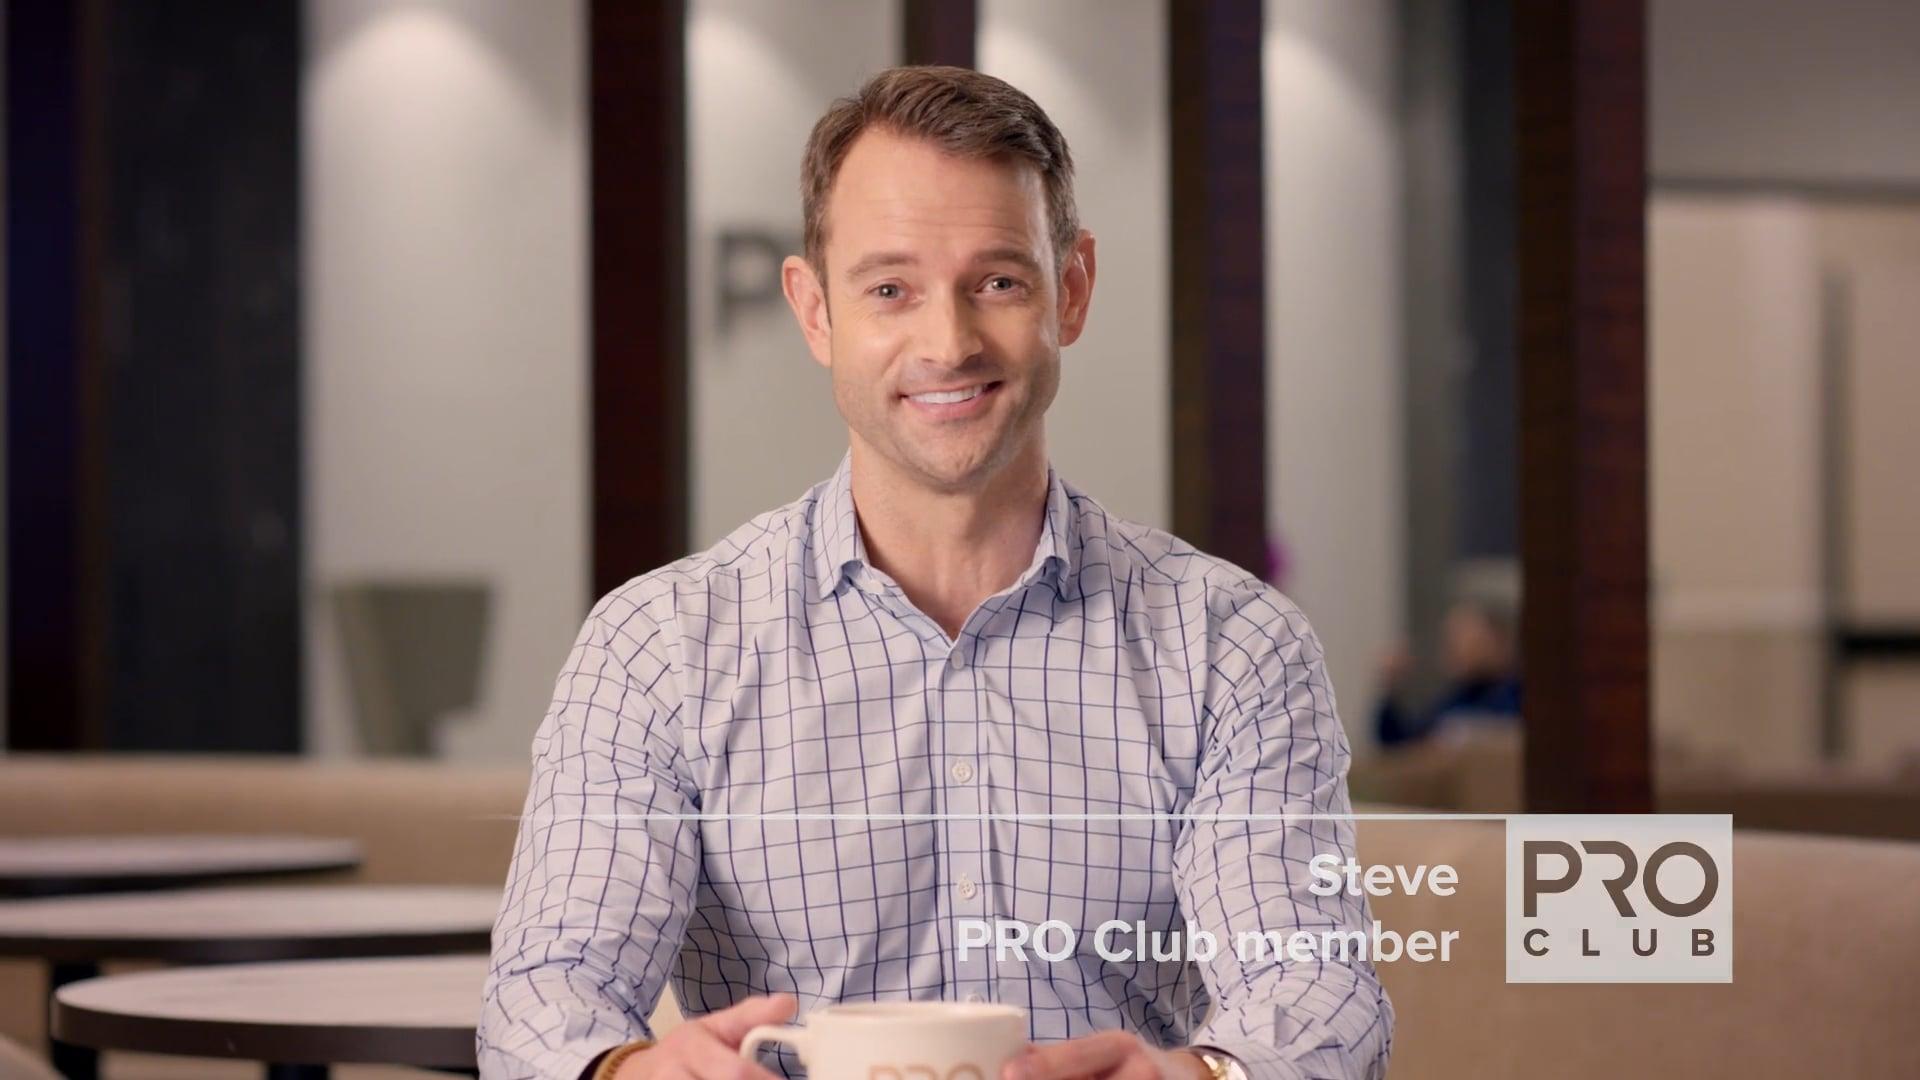 PRO Club - Steve